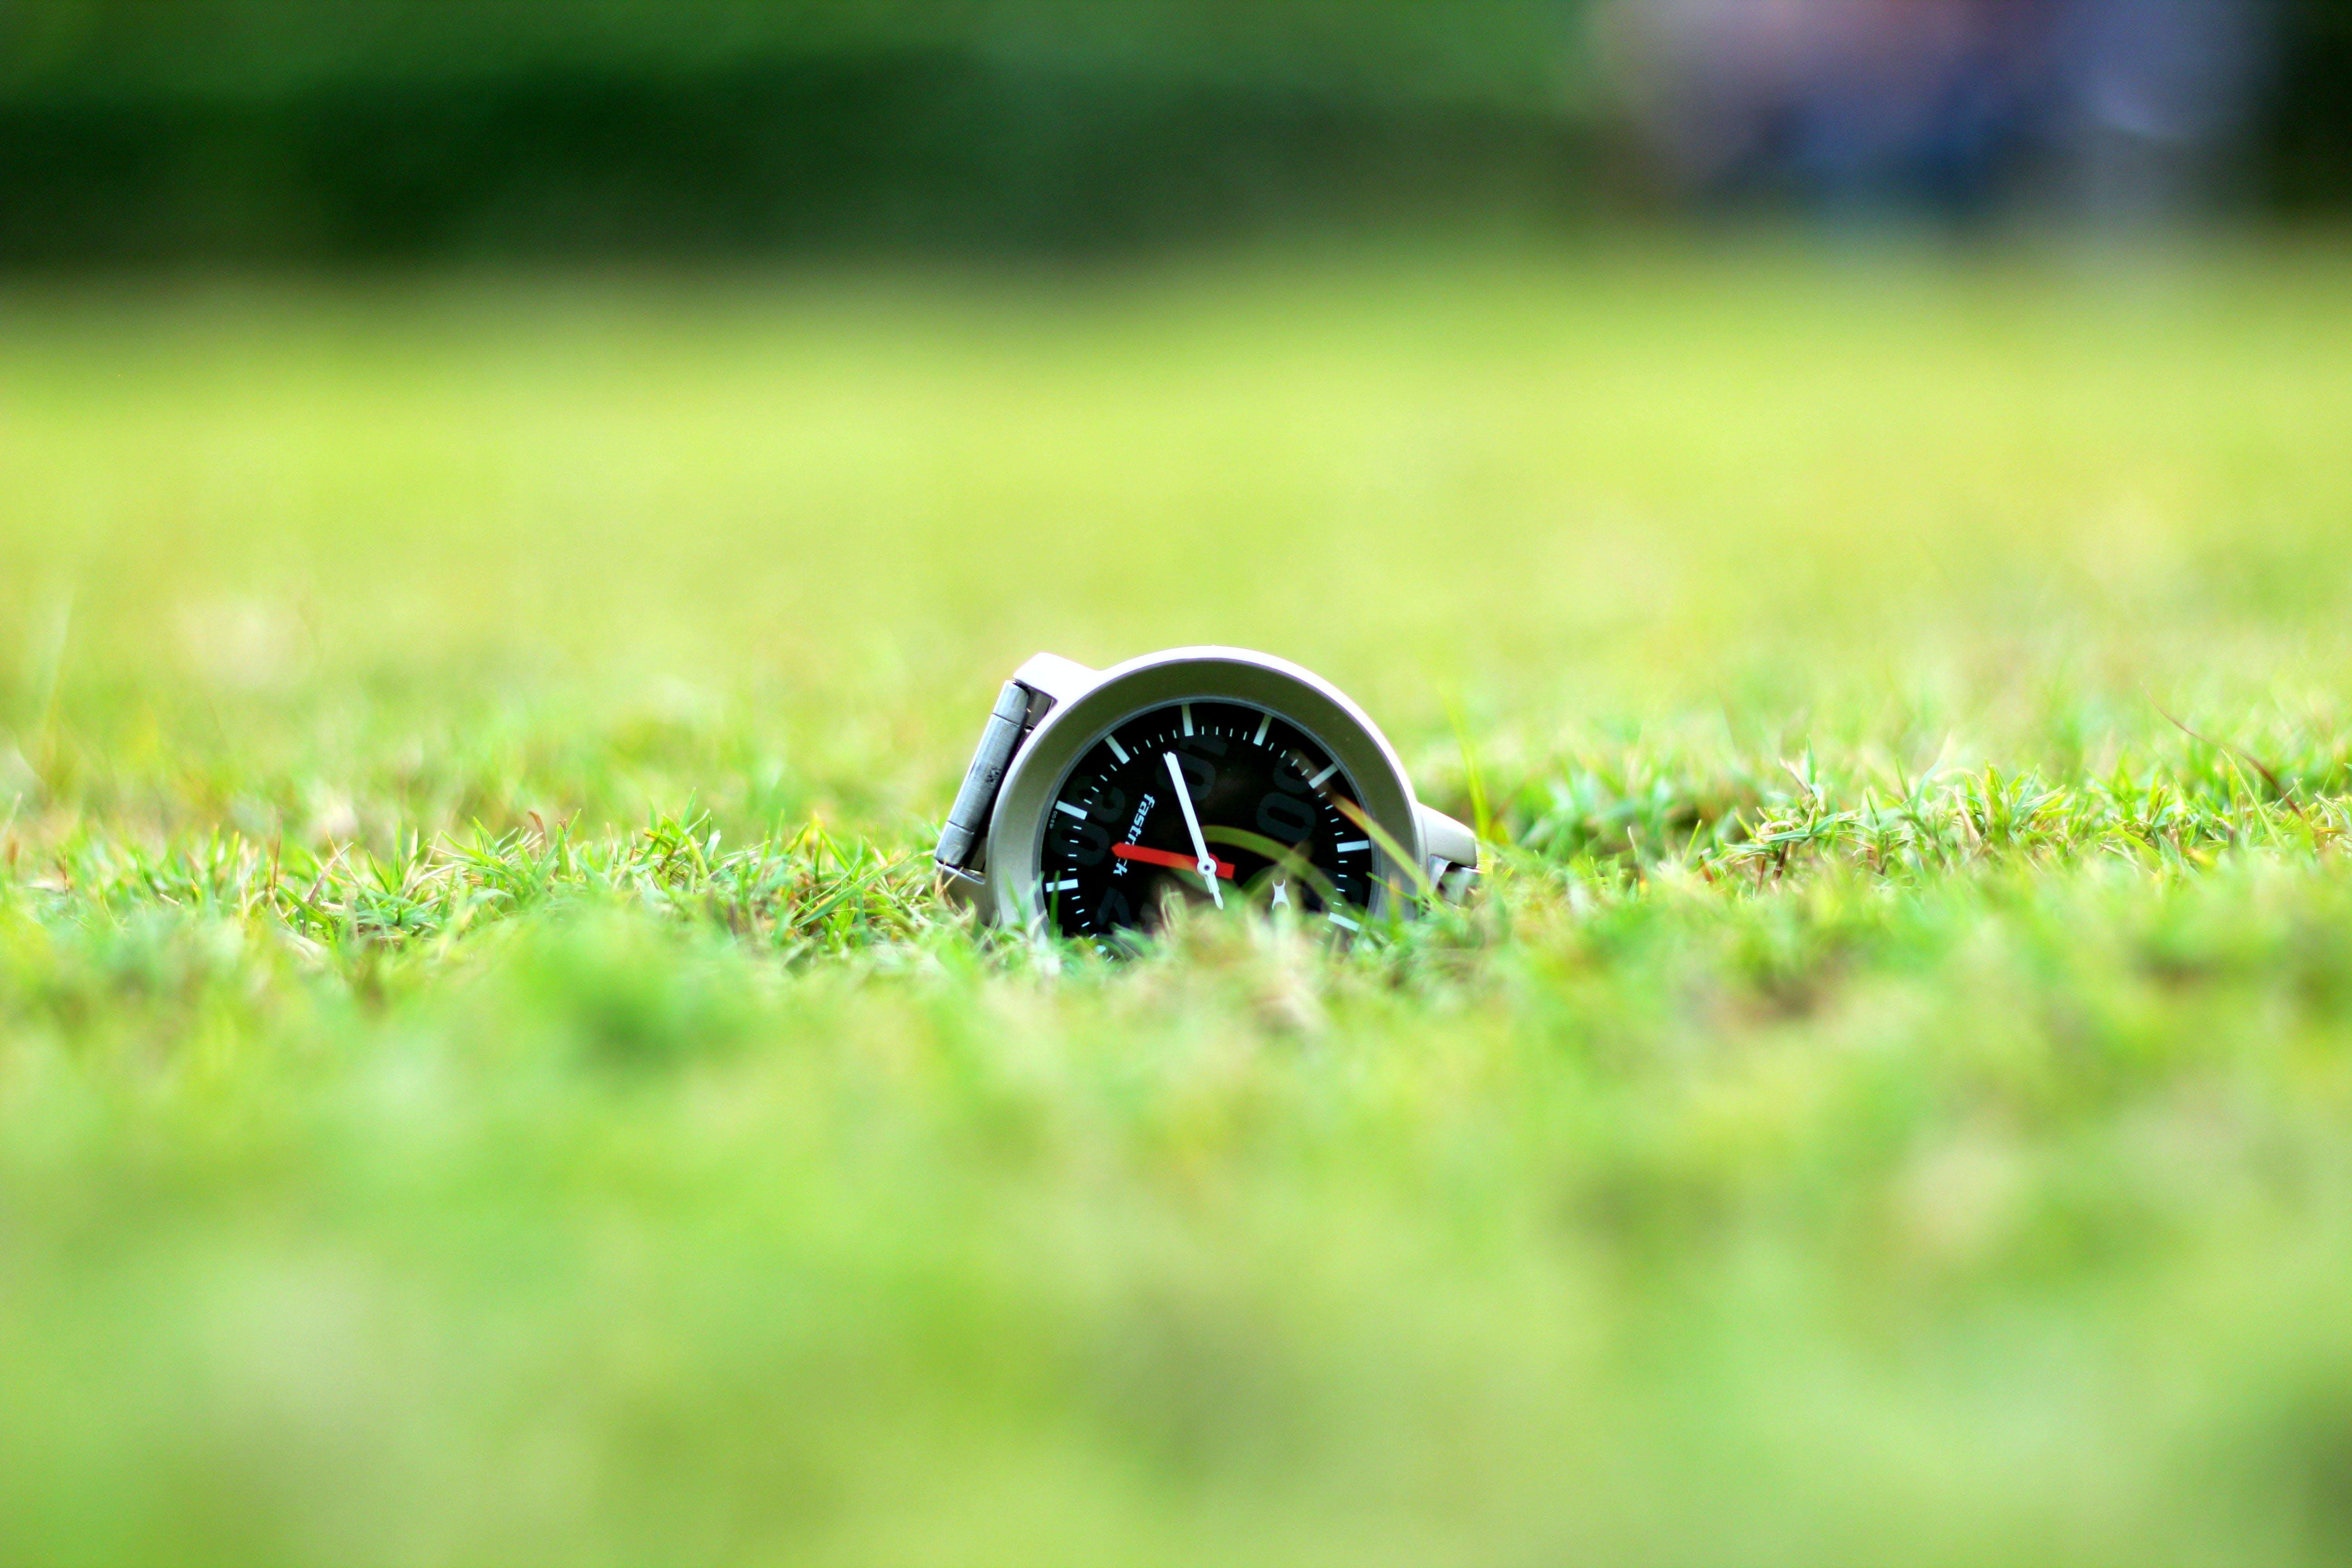 Round Grey And Black Analog Watch On Green Grass